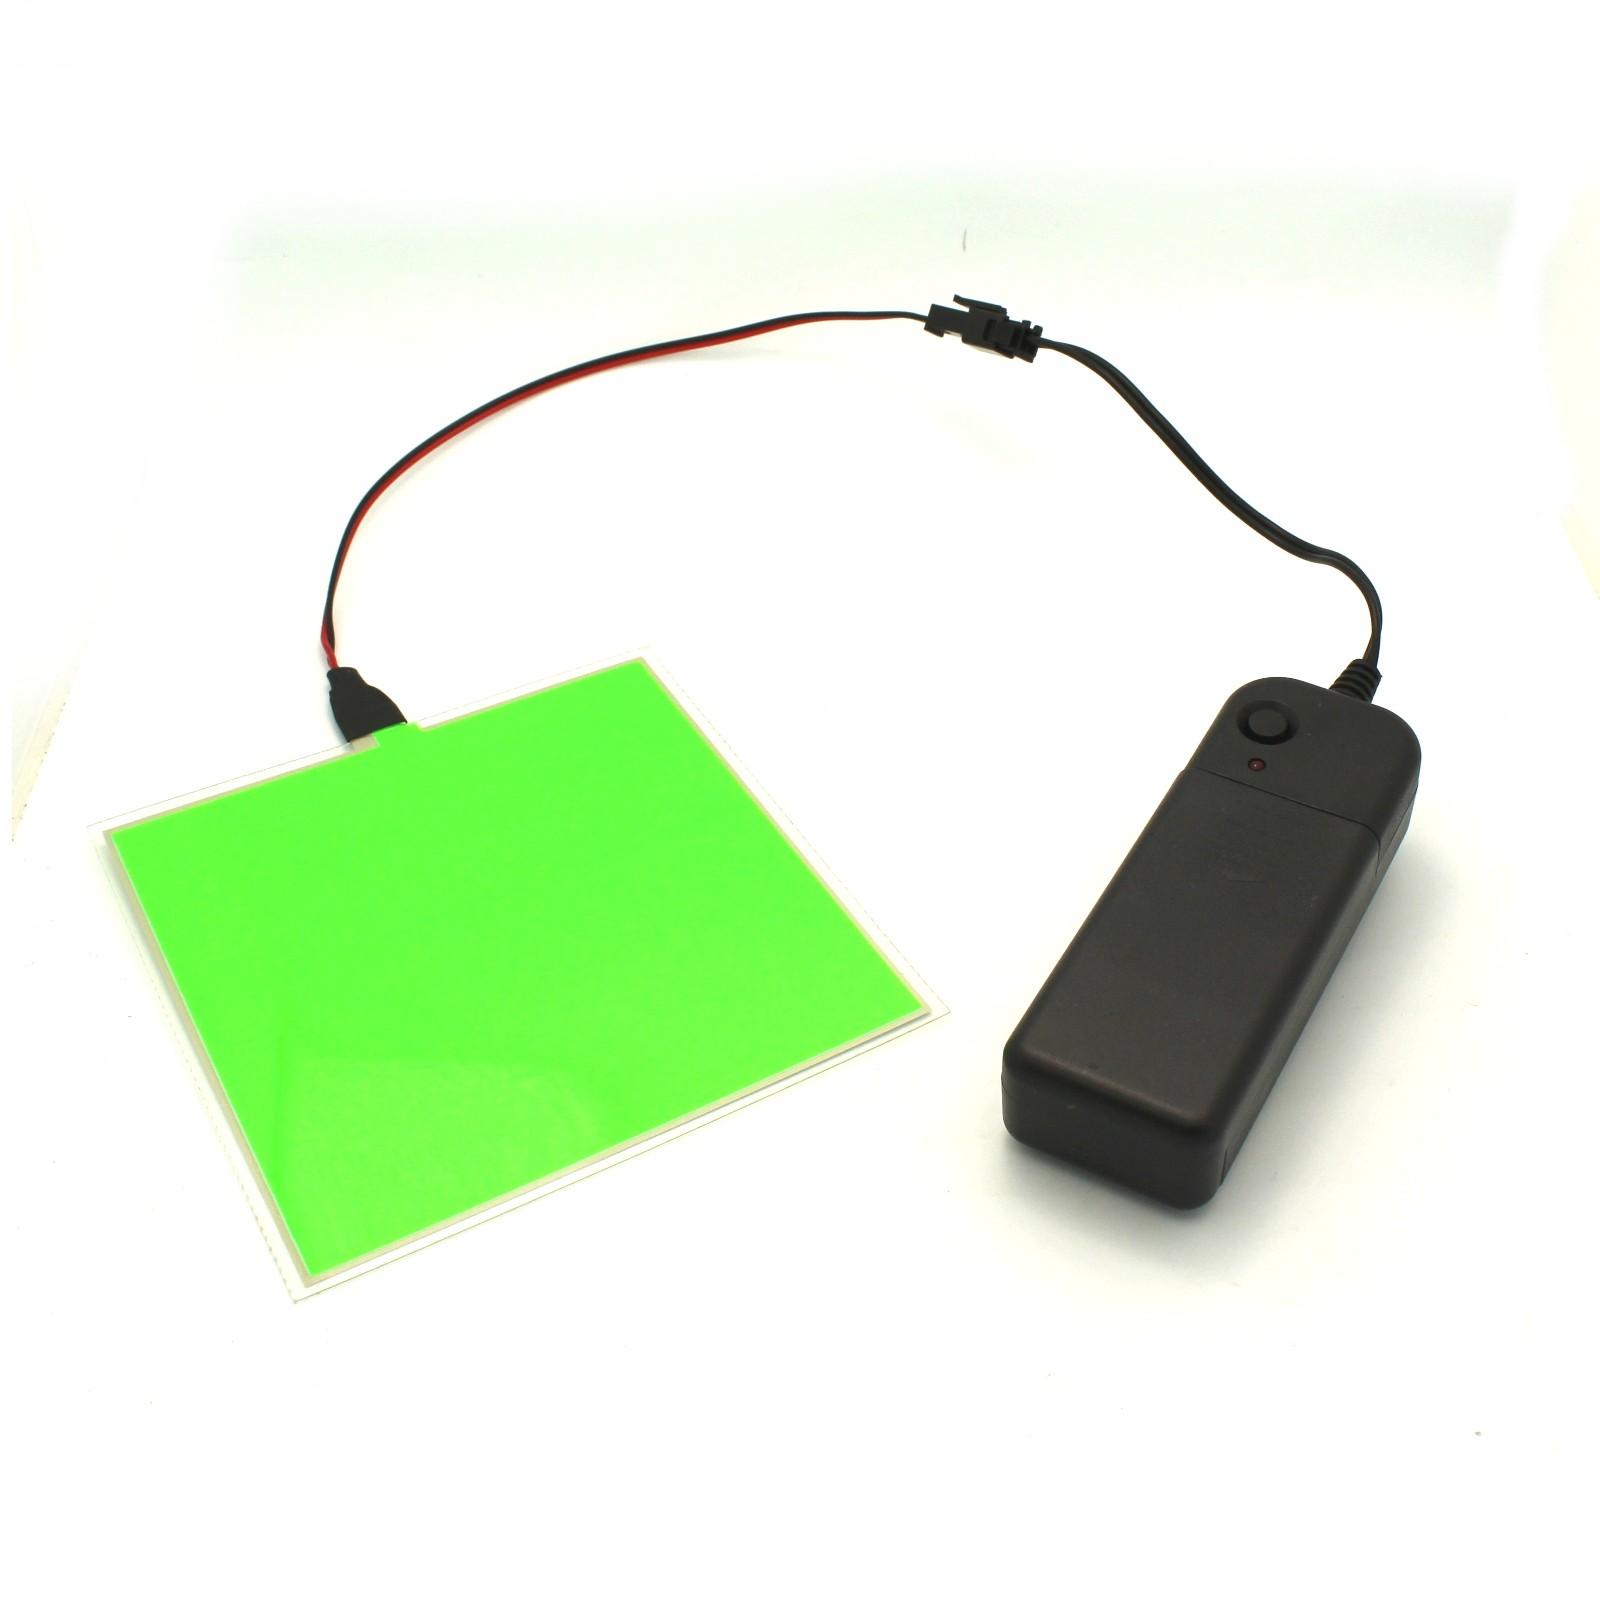 $17.99 - Cuttable Green EL Panel + Battery Pack - Tinkersphere